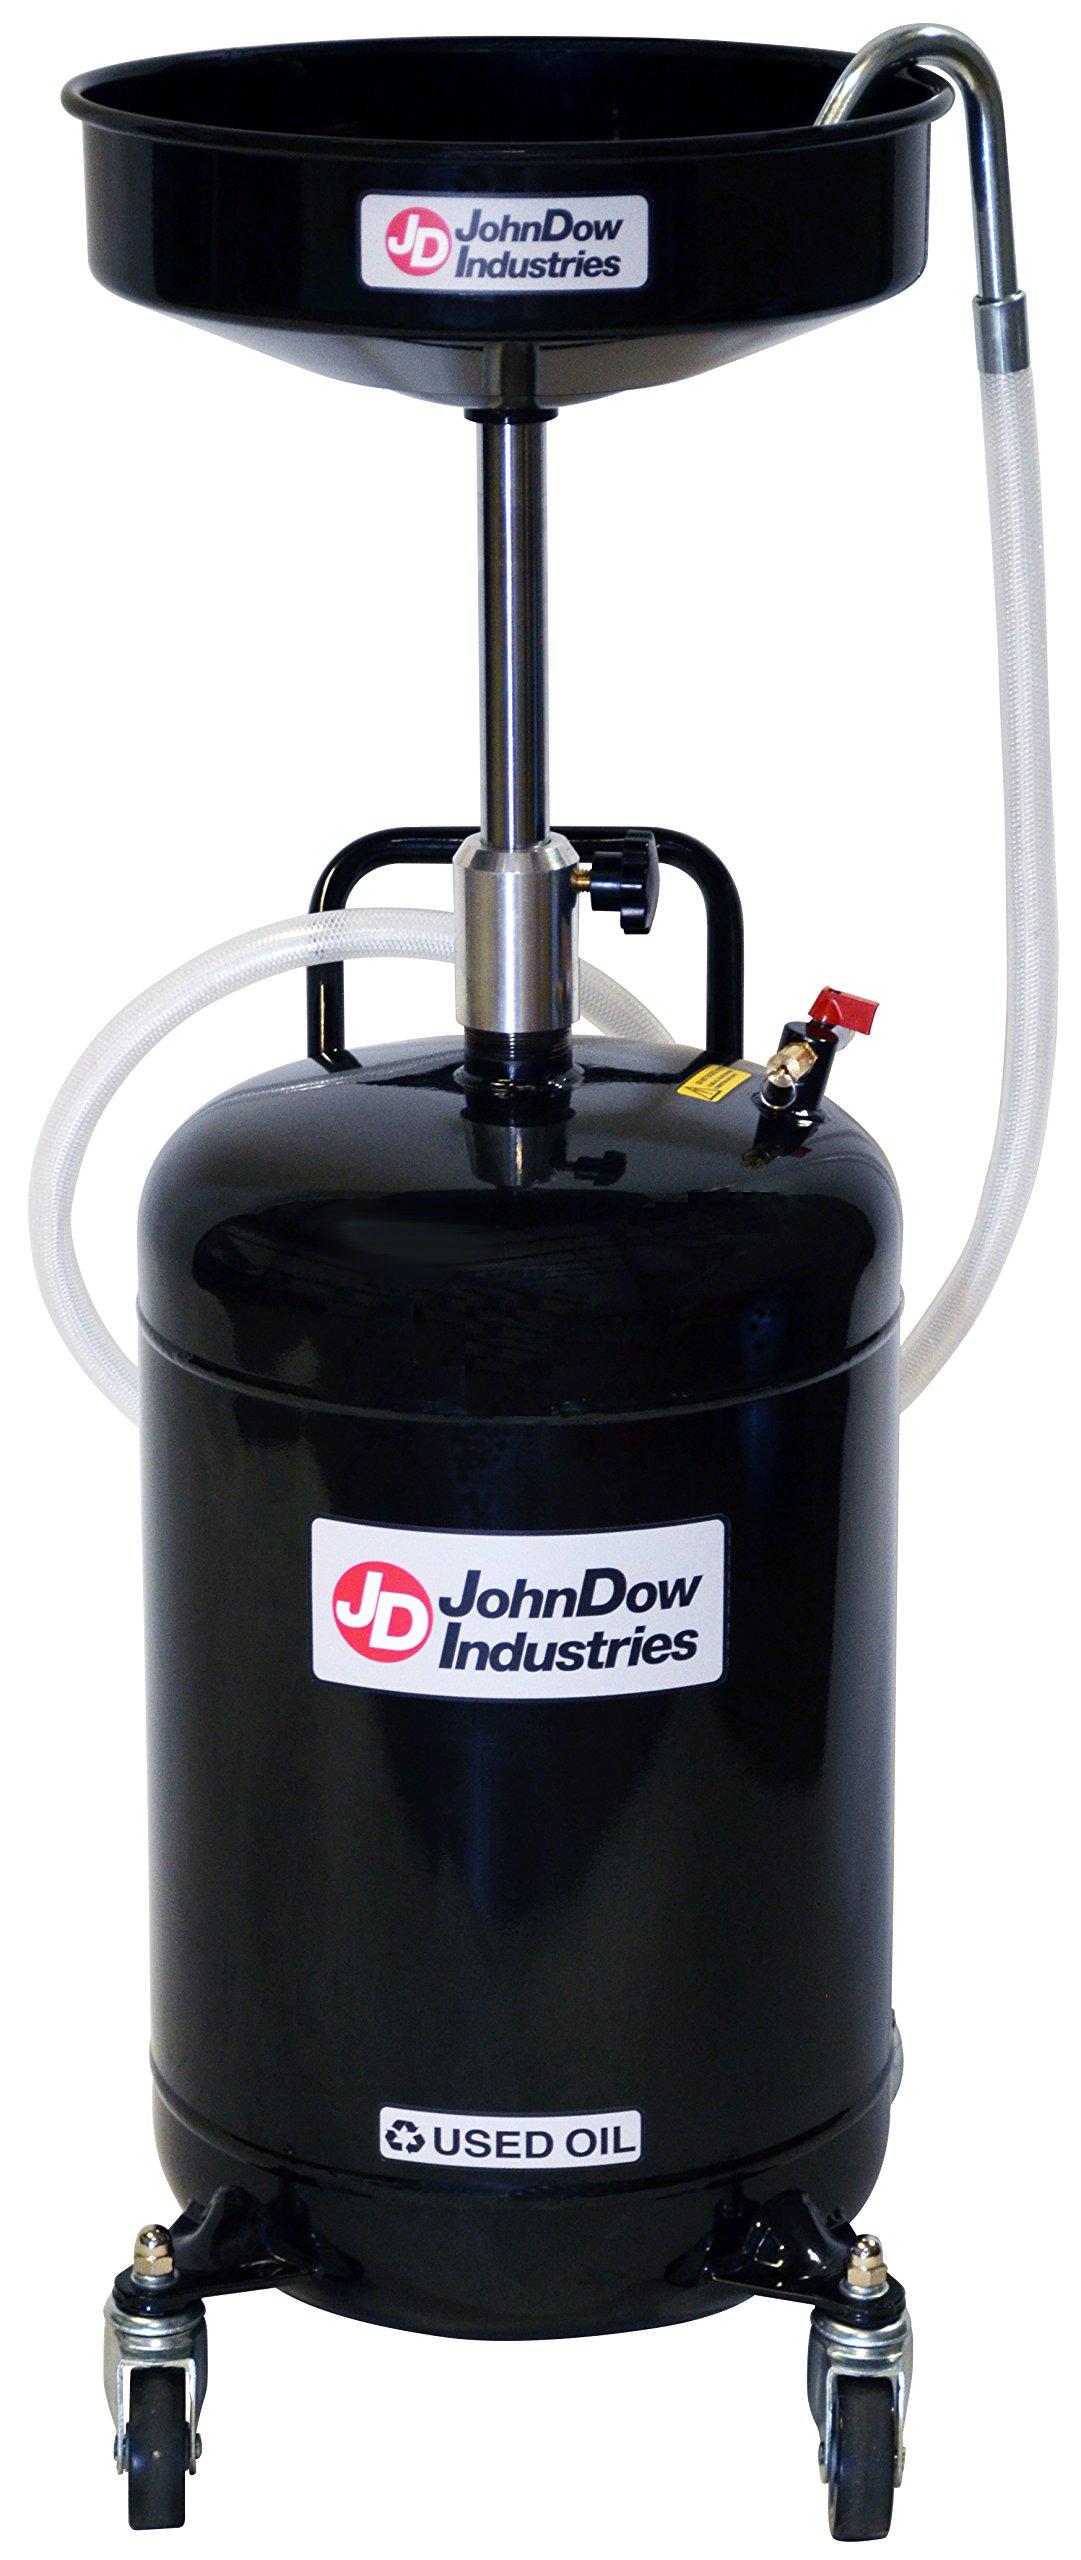 John Dow Industries JDI-18DC 18-Gallon Self-Evacuating Portable Oil Drain by JohnDow Industries